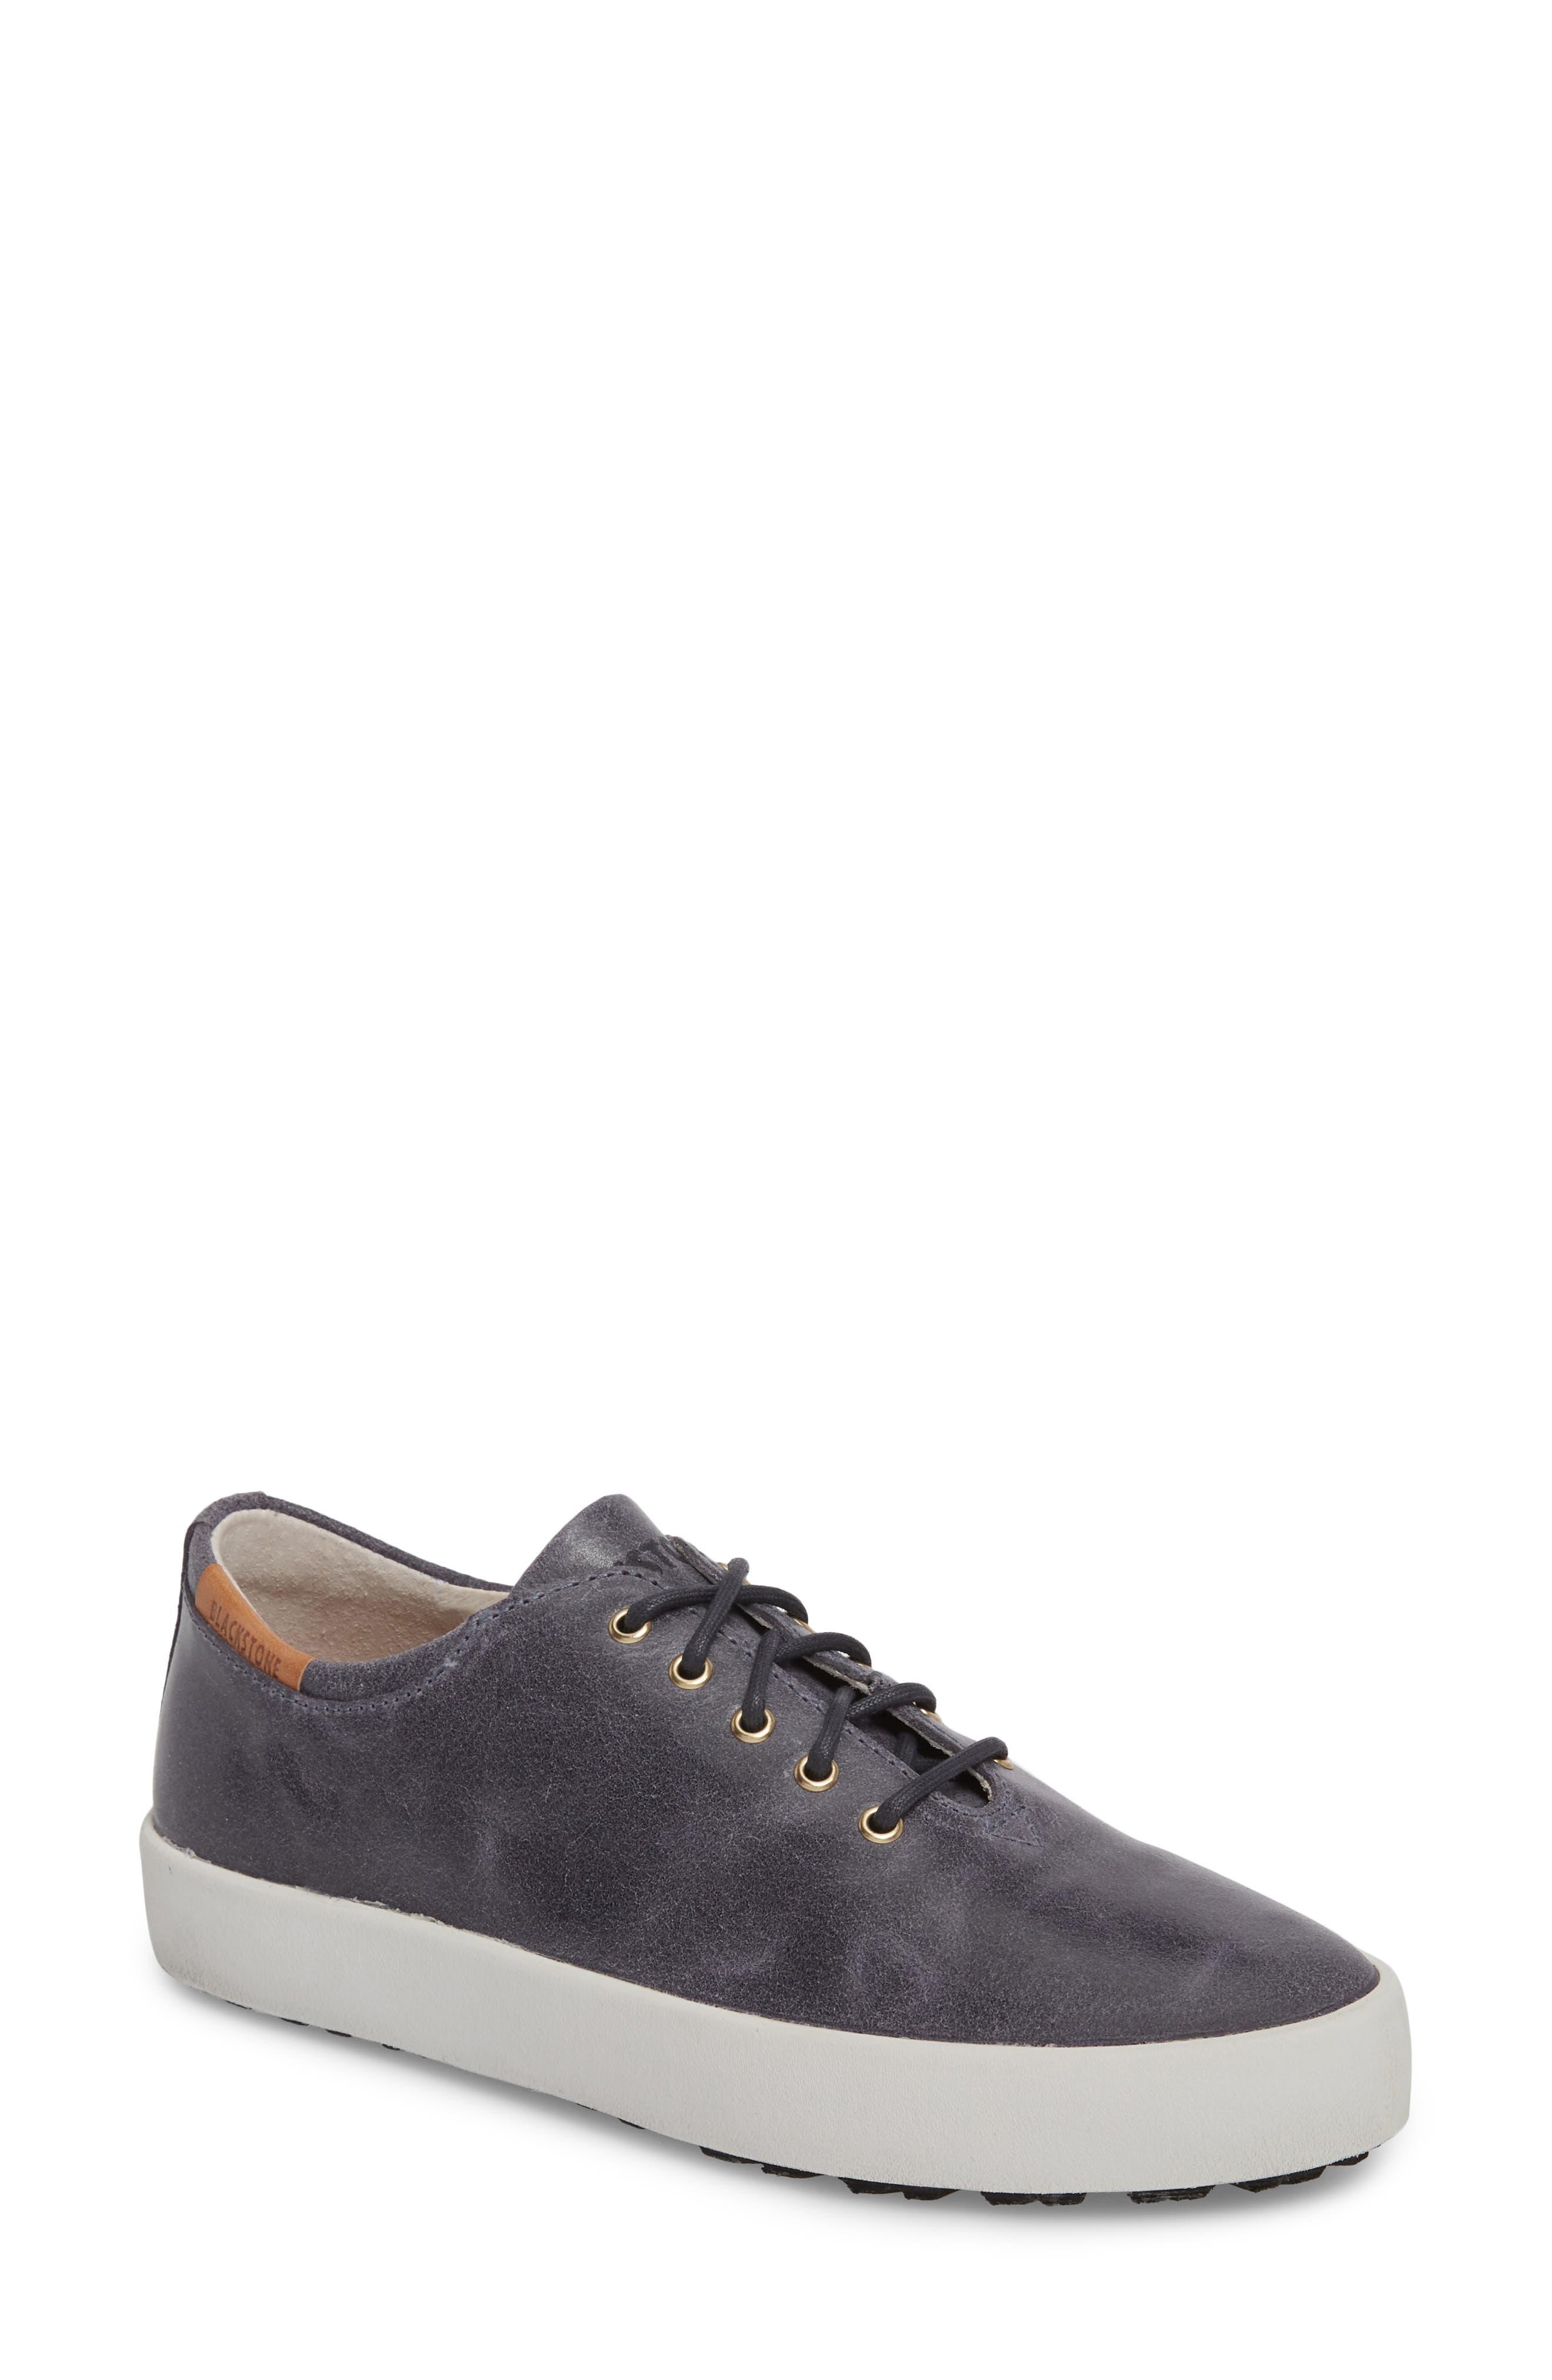 PL74 Sneaker,                         Main,                         color, Periscope Leather